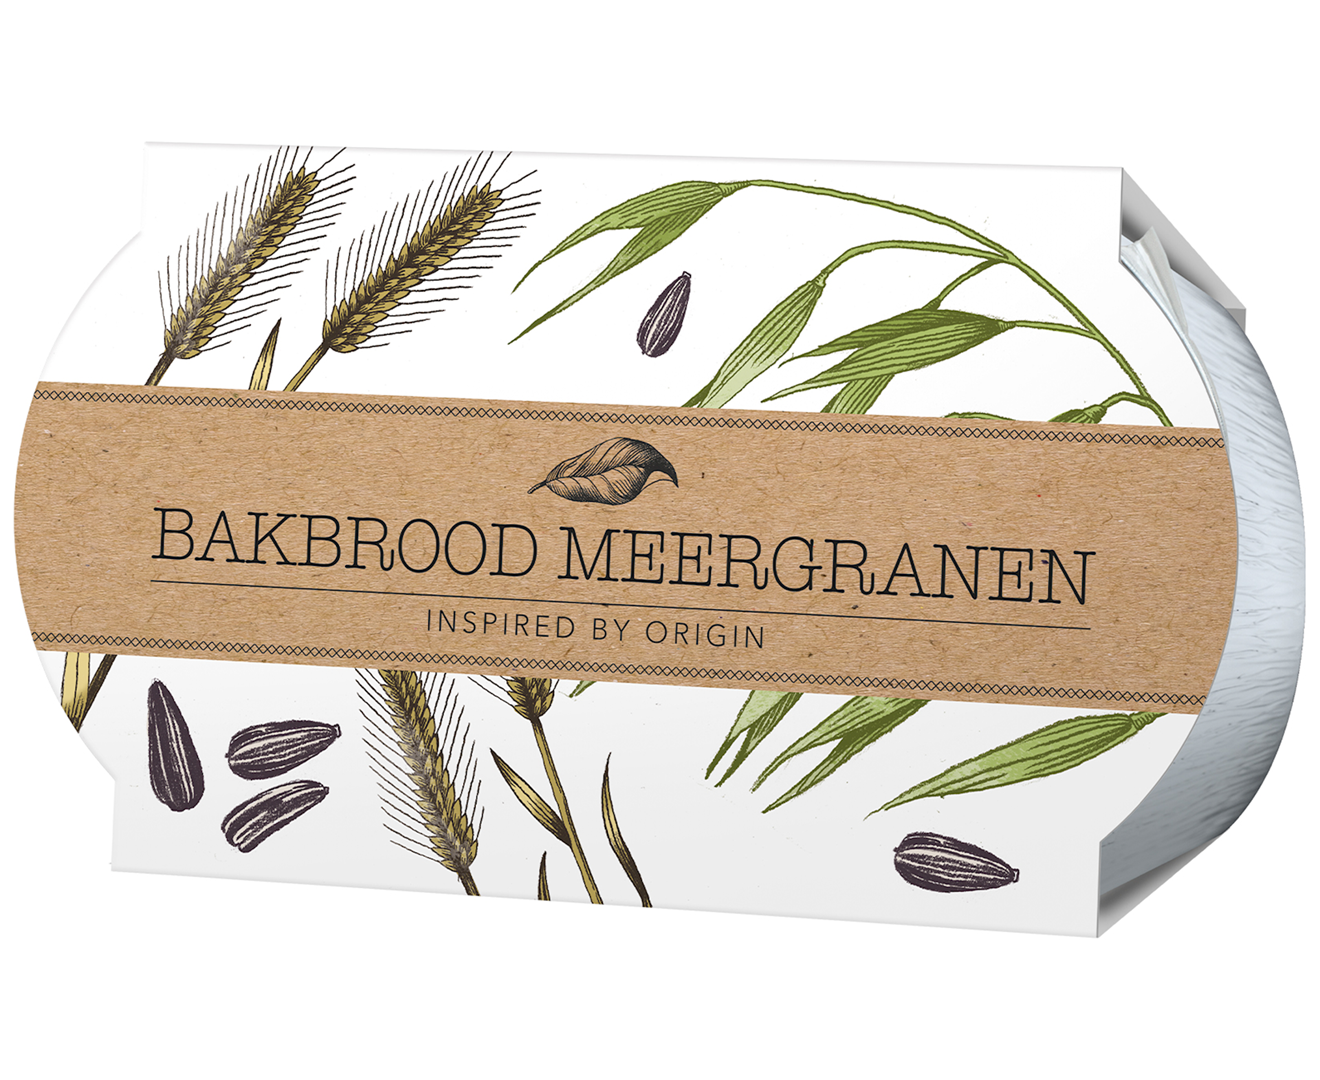 Productafbeelding Bakbrood Inspired by origin 350g verpakt